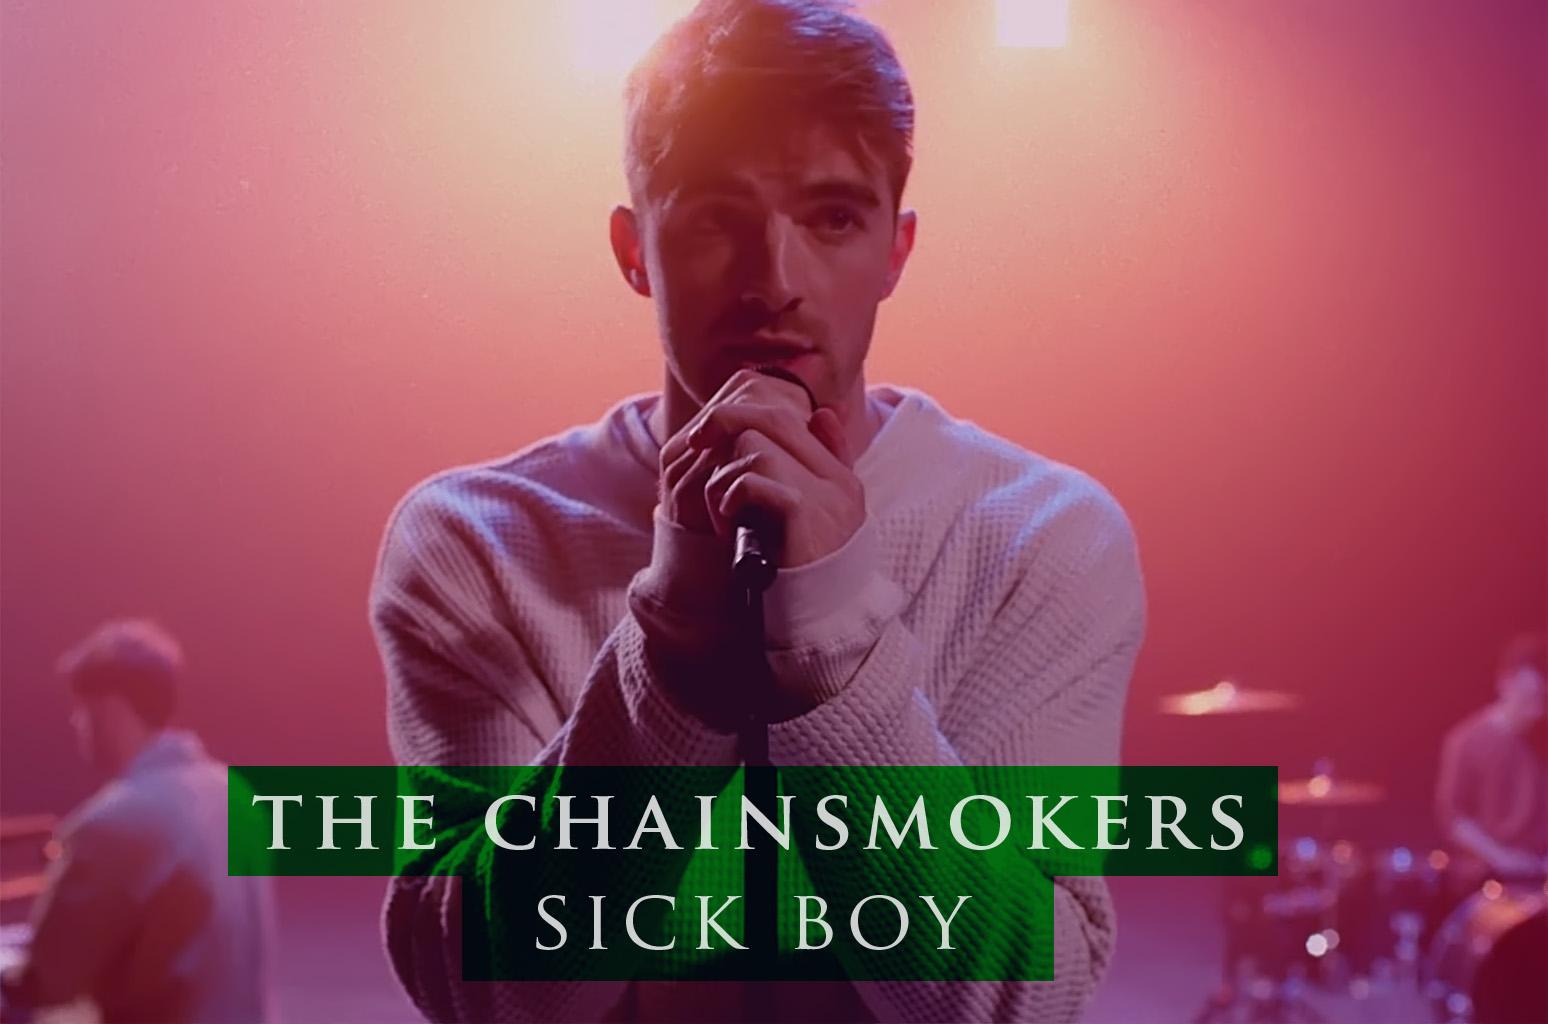 Guitar Chords The Chainsmokers Sick Boy Lyrics And Guitar Chords